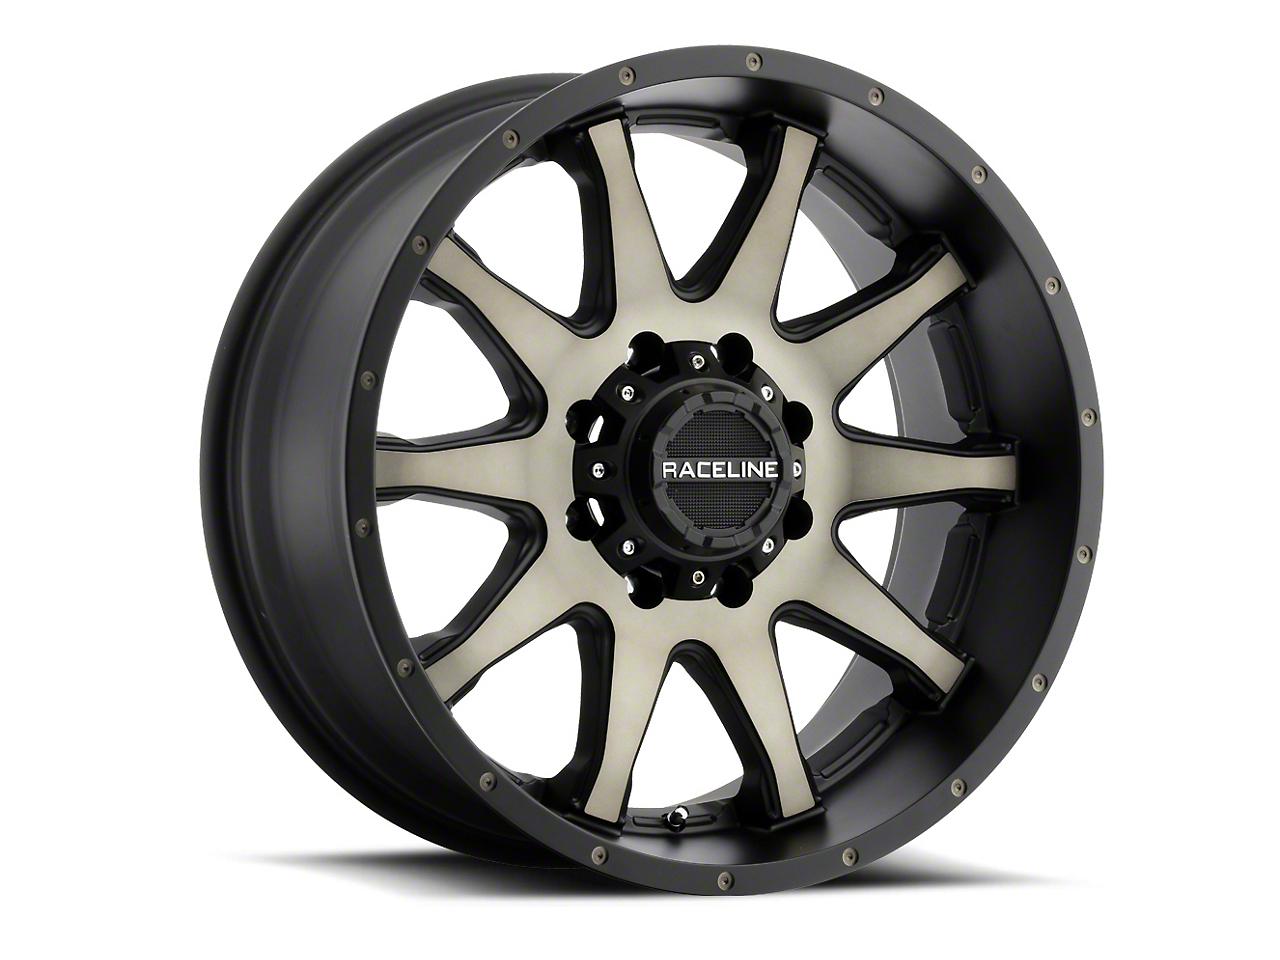 Raceline Shift Black Machined w/ Dark Tint 6-Lug Wheel - 17x8.5 (07-18 Sierra 1500)